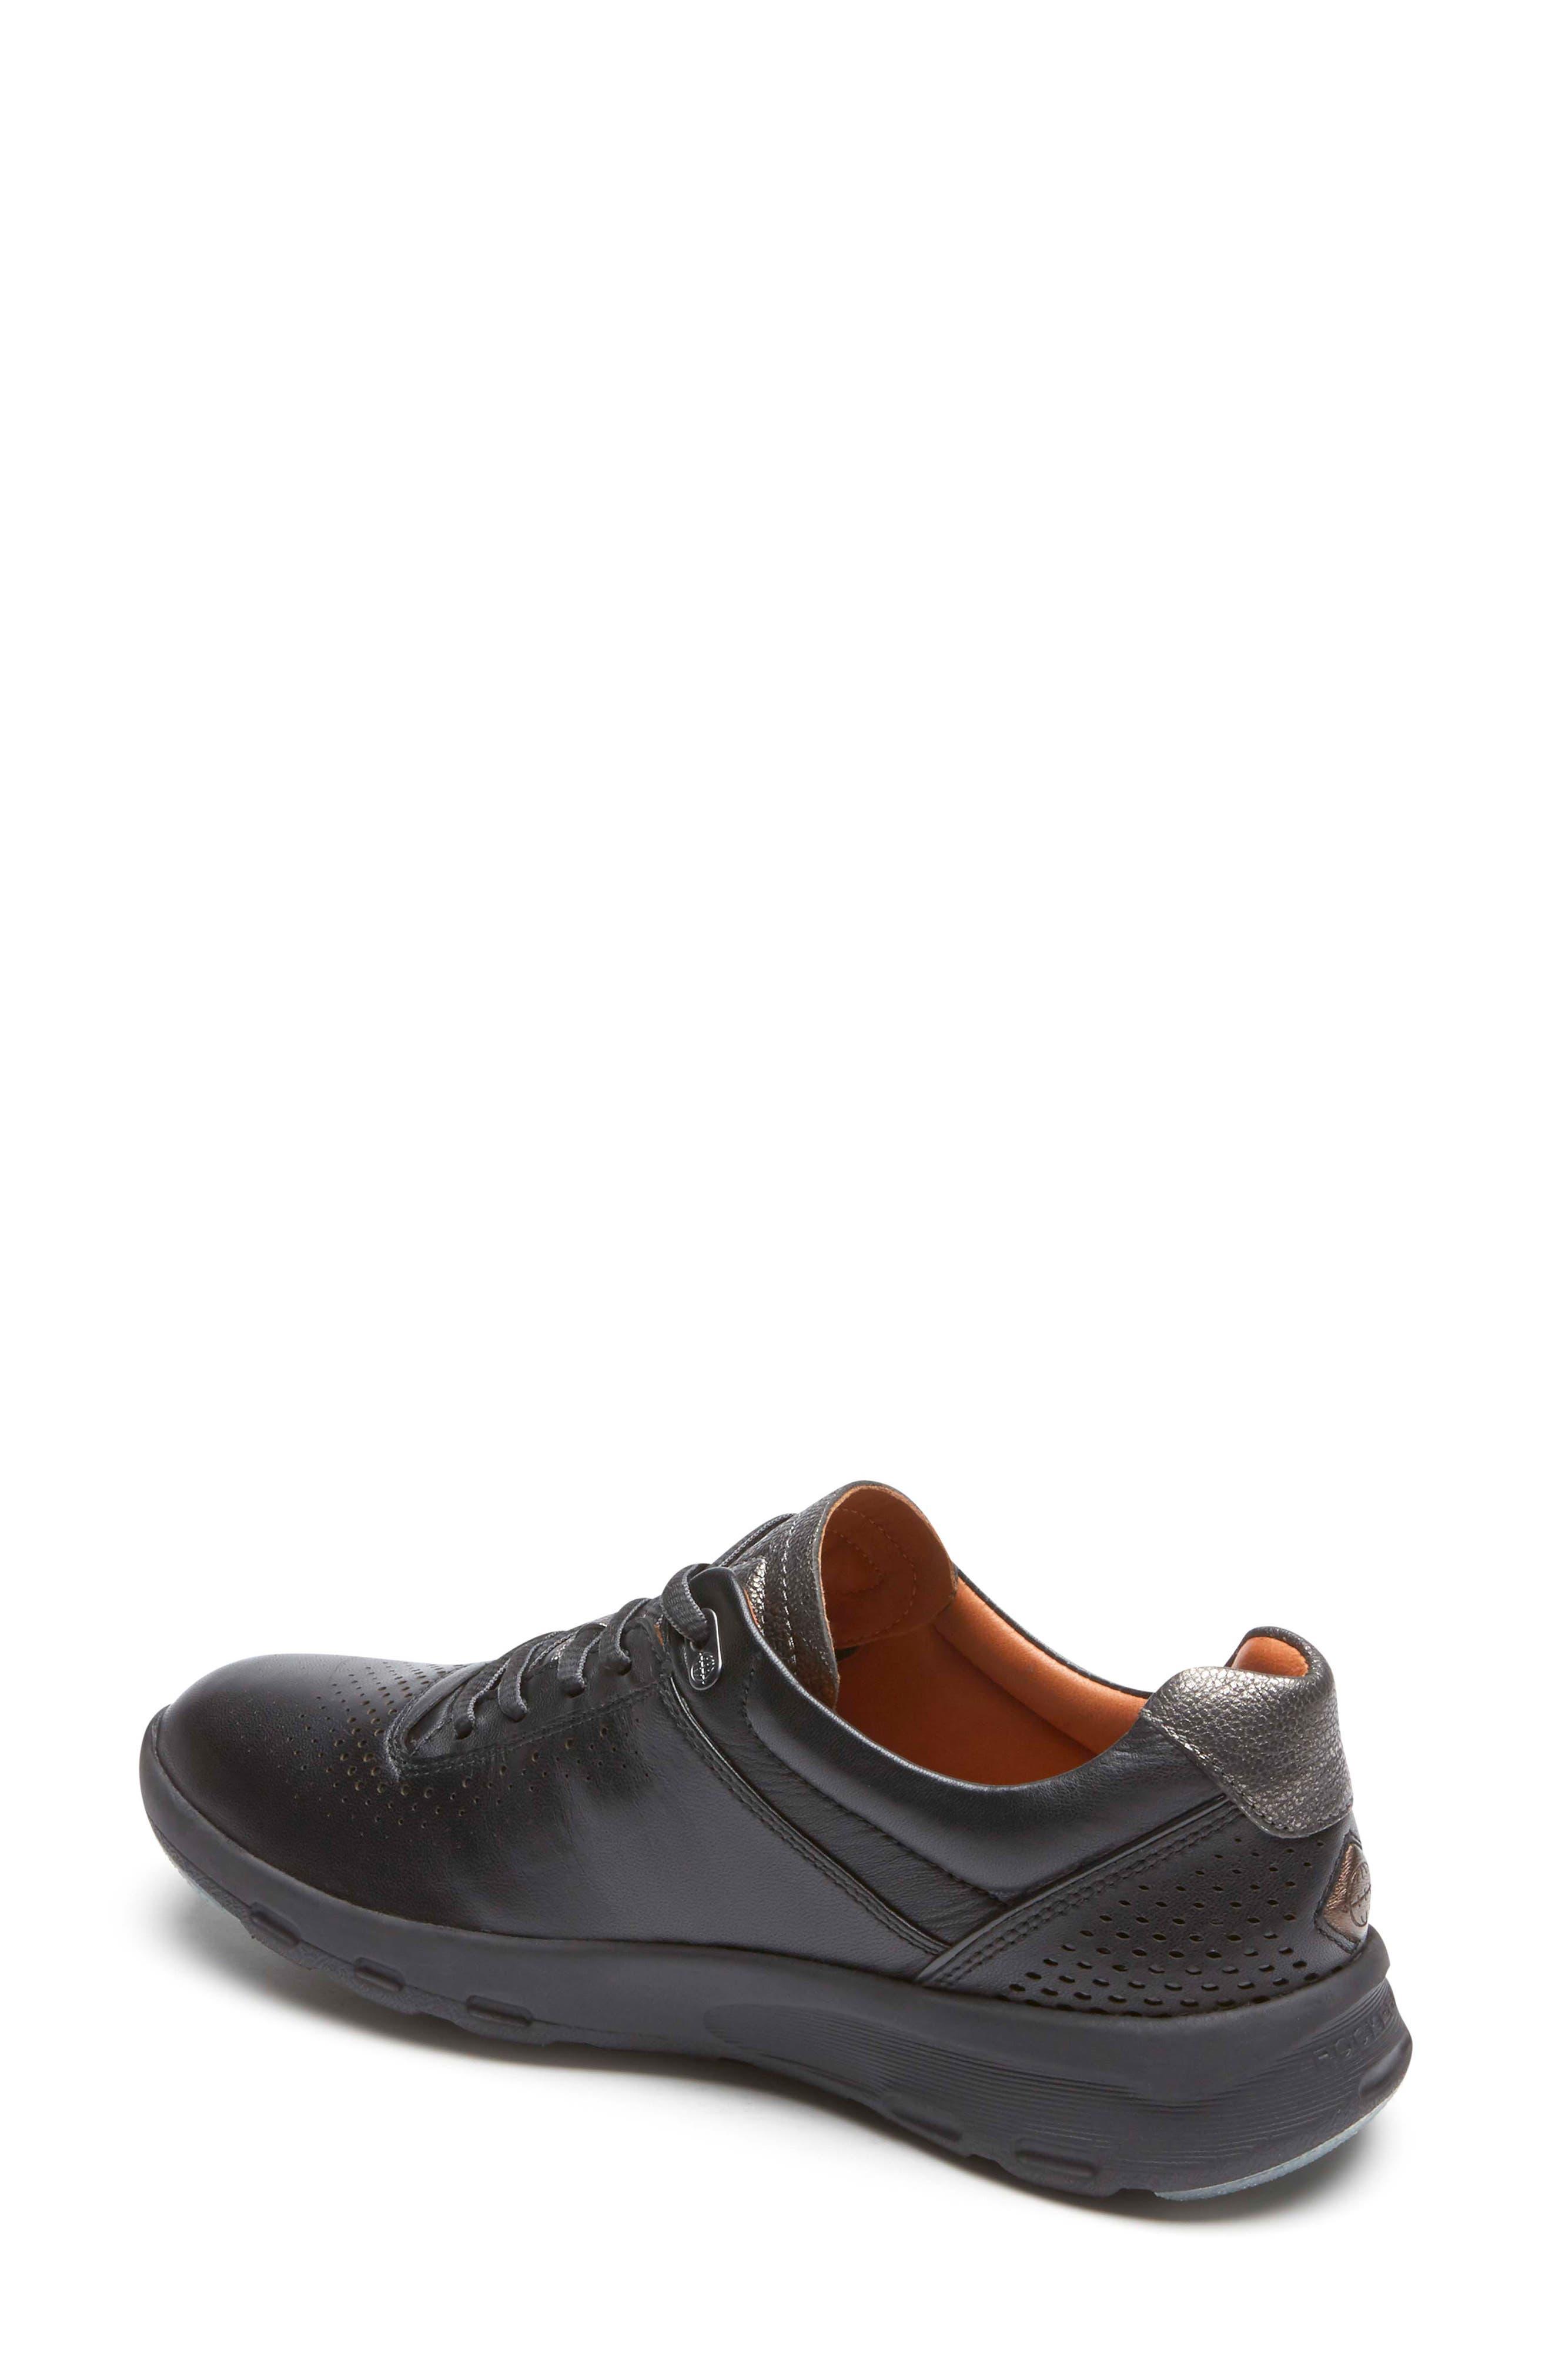 ROCKPORT,                             Let's Walk<sup>®</sup> Ubal Sneaker,                             Alternate thumbnail 2, color,                             BLACK/ BLACK LEATHER